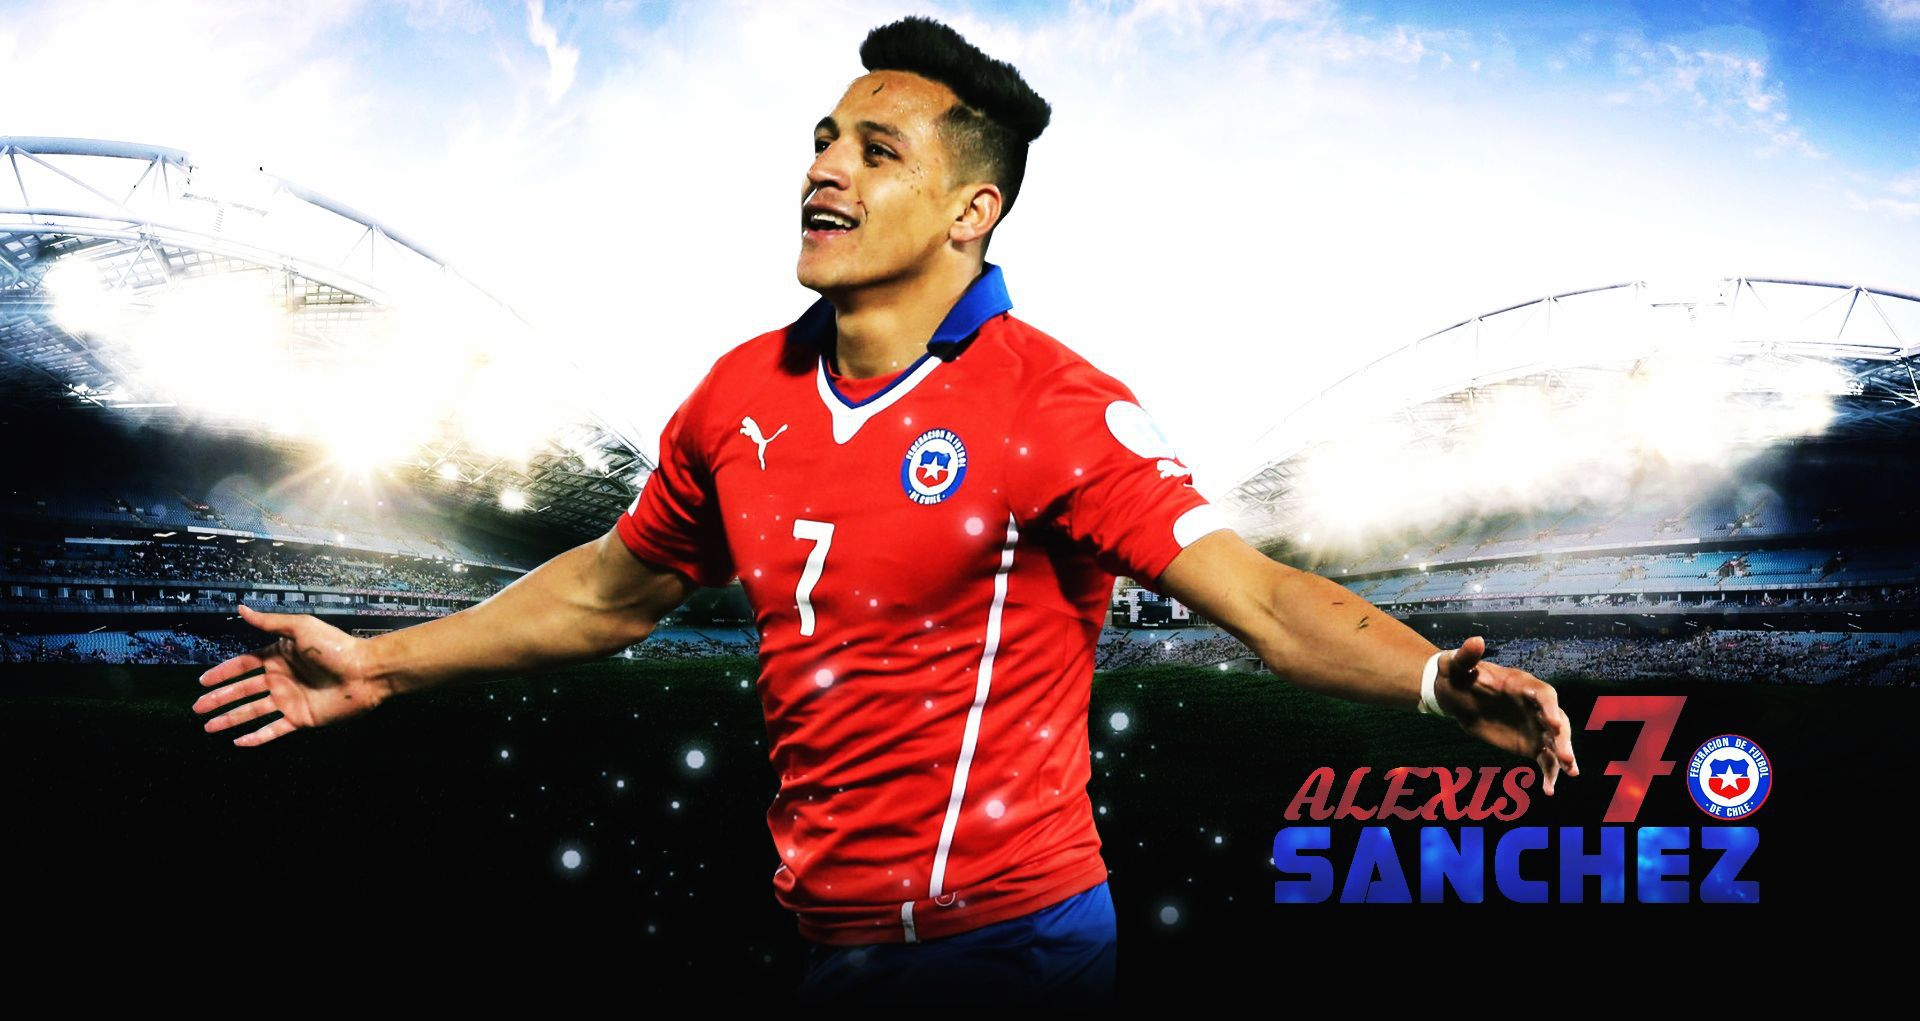 Alexis Sanchez High Quality Wallpapers